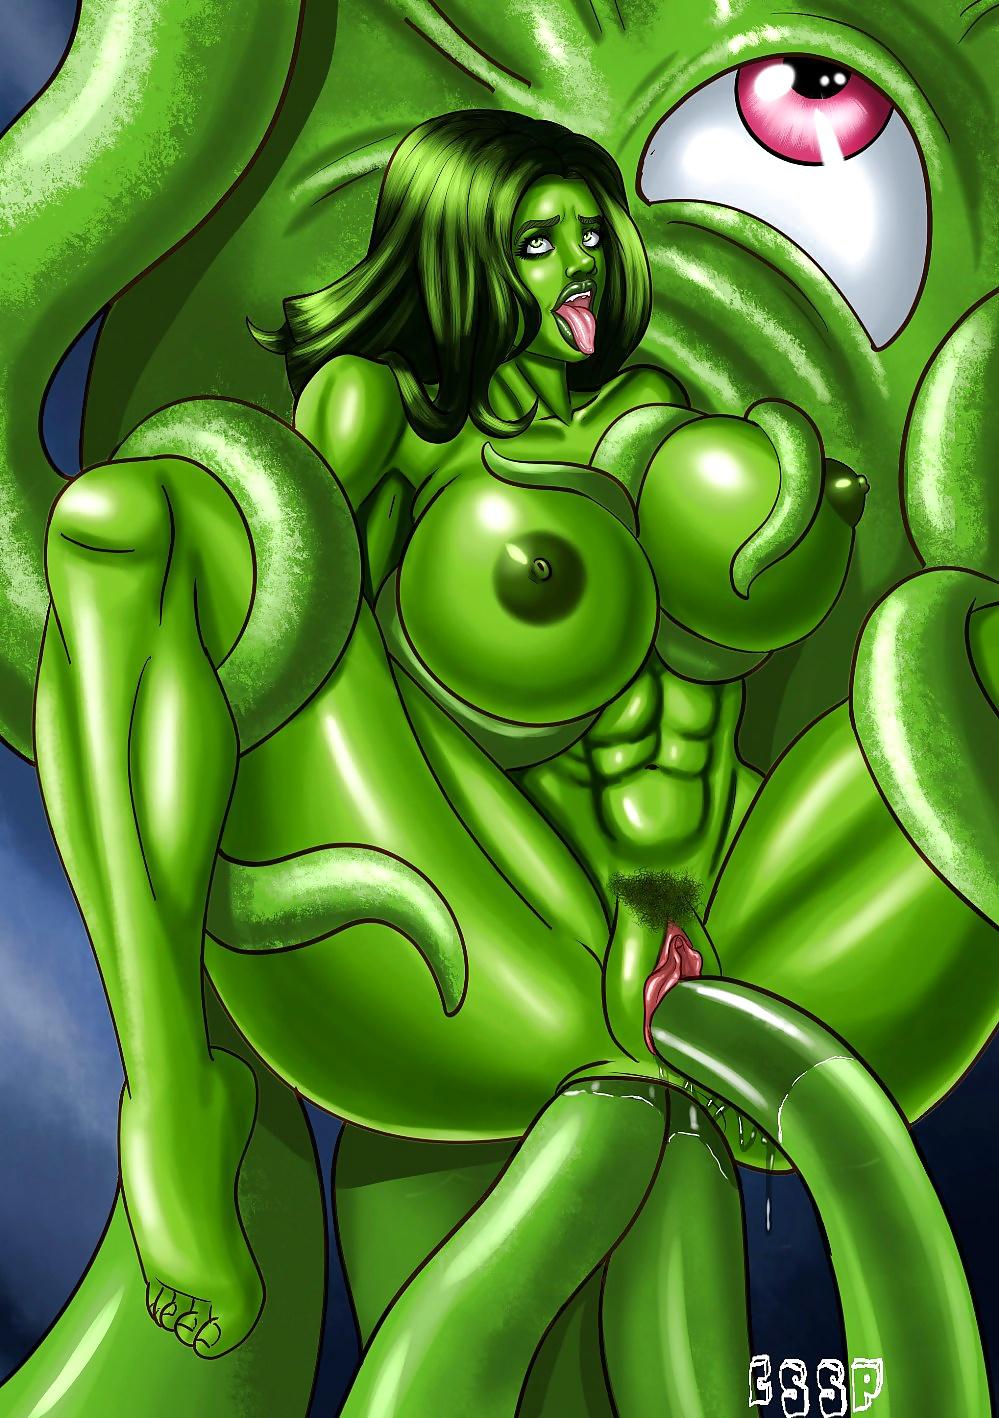 Hulk hands girl tits — 9